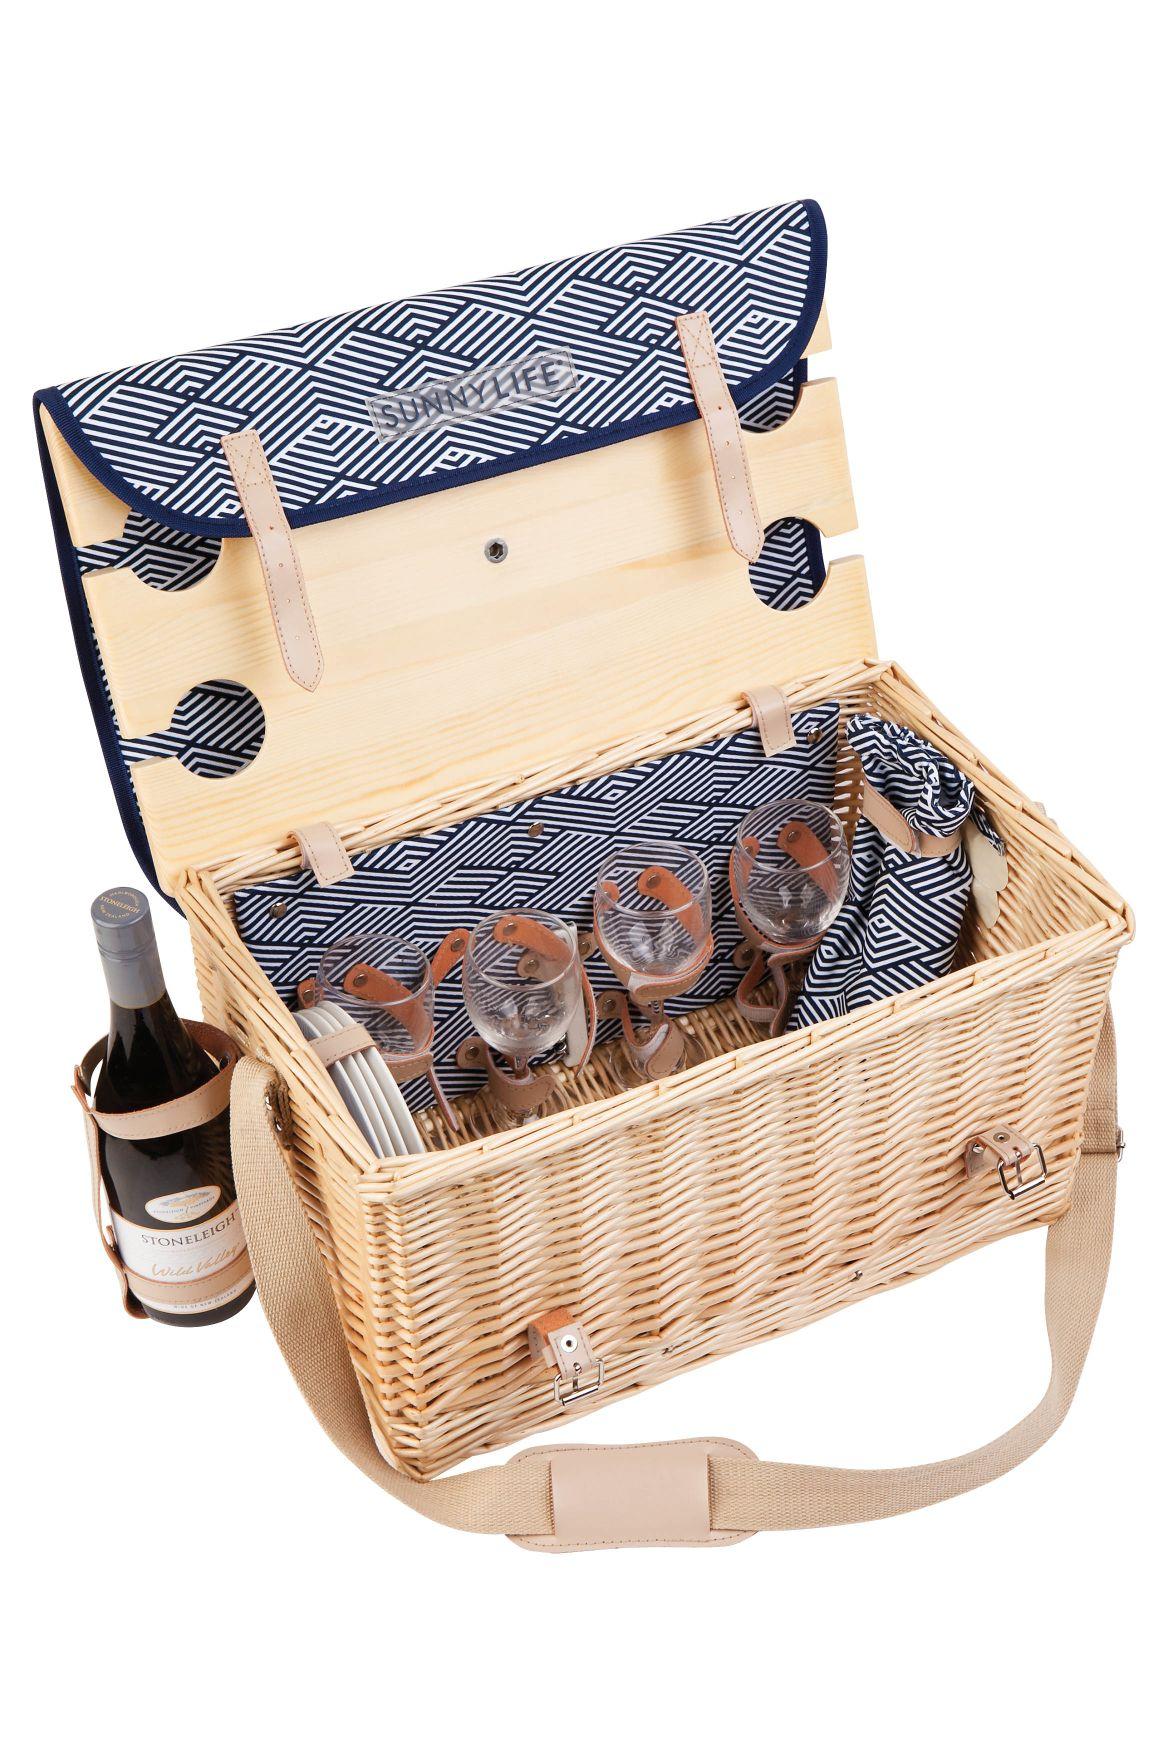 21gyrofish_sunnylife-deluxe-picnic-basket-andaman.jpg